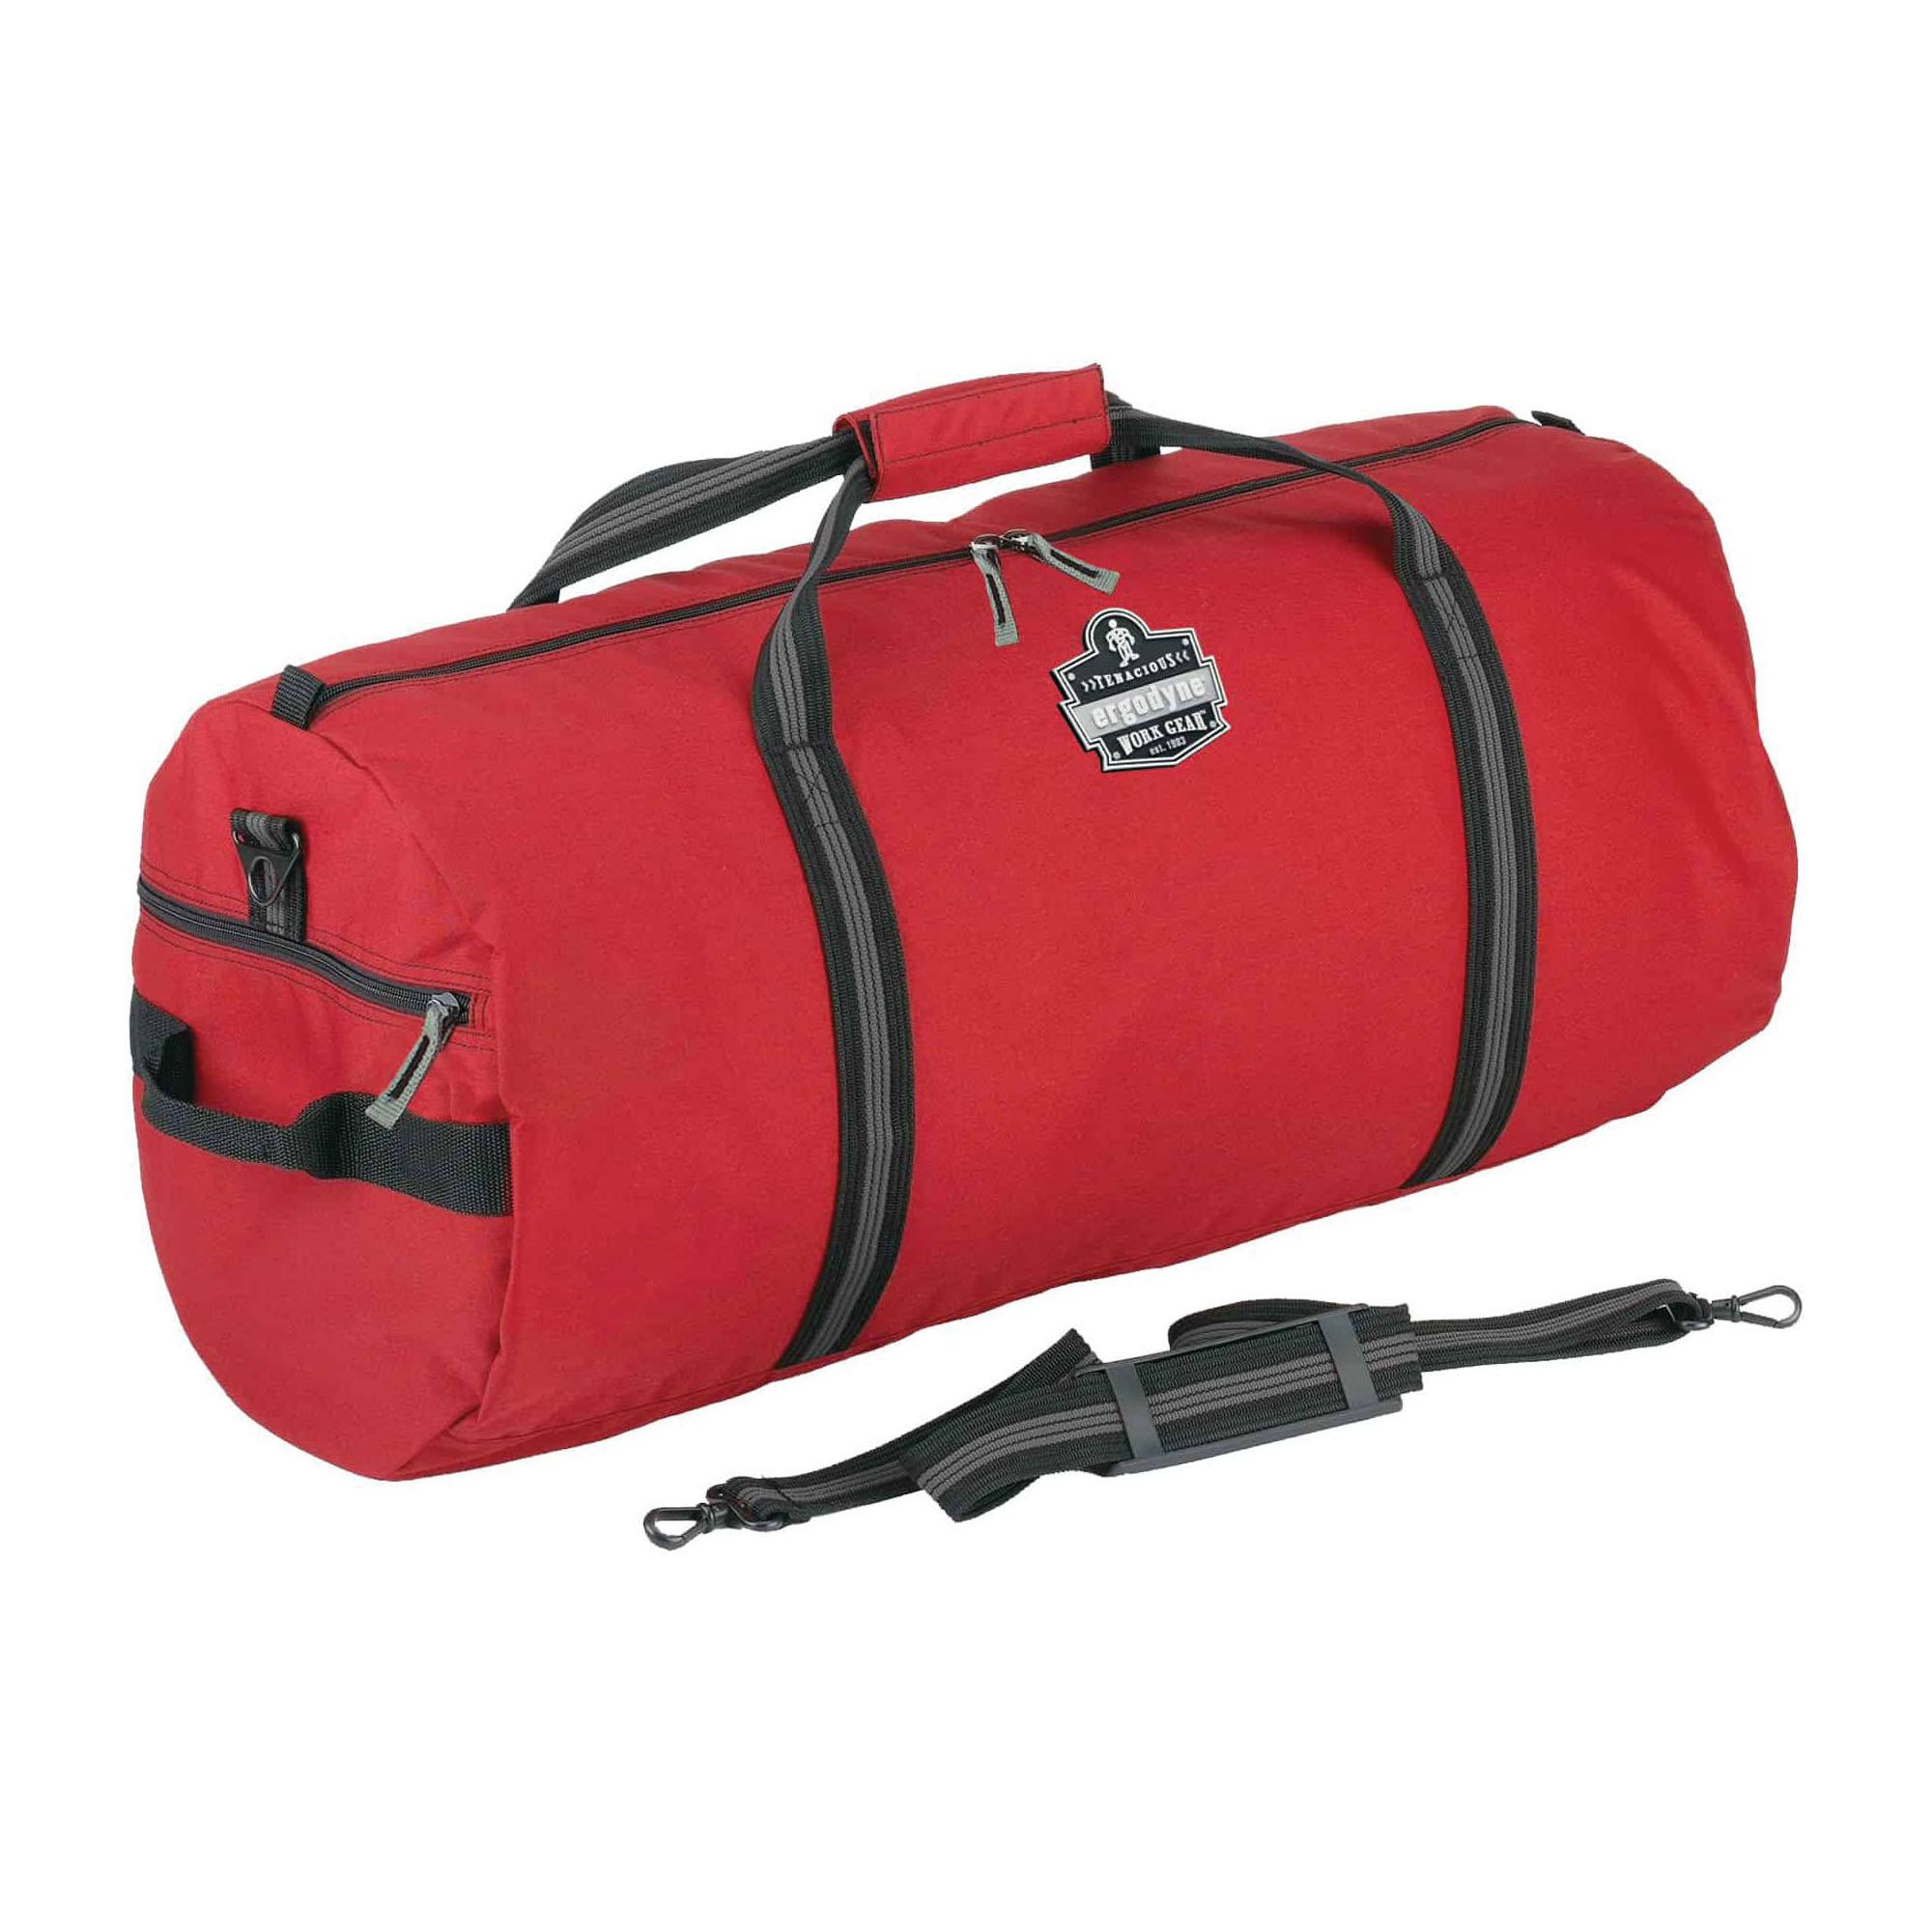 Arsenal® 13020 5020 Small Standard Gear Duffel Bag, Red, 600D Nylon, 2600 cu-in Storage, 12 in H x 12 in W x 23 in D